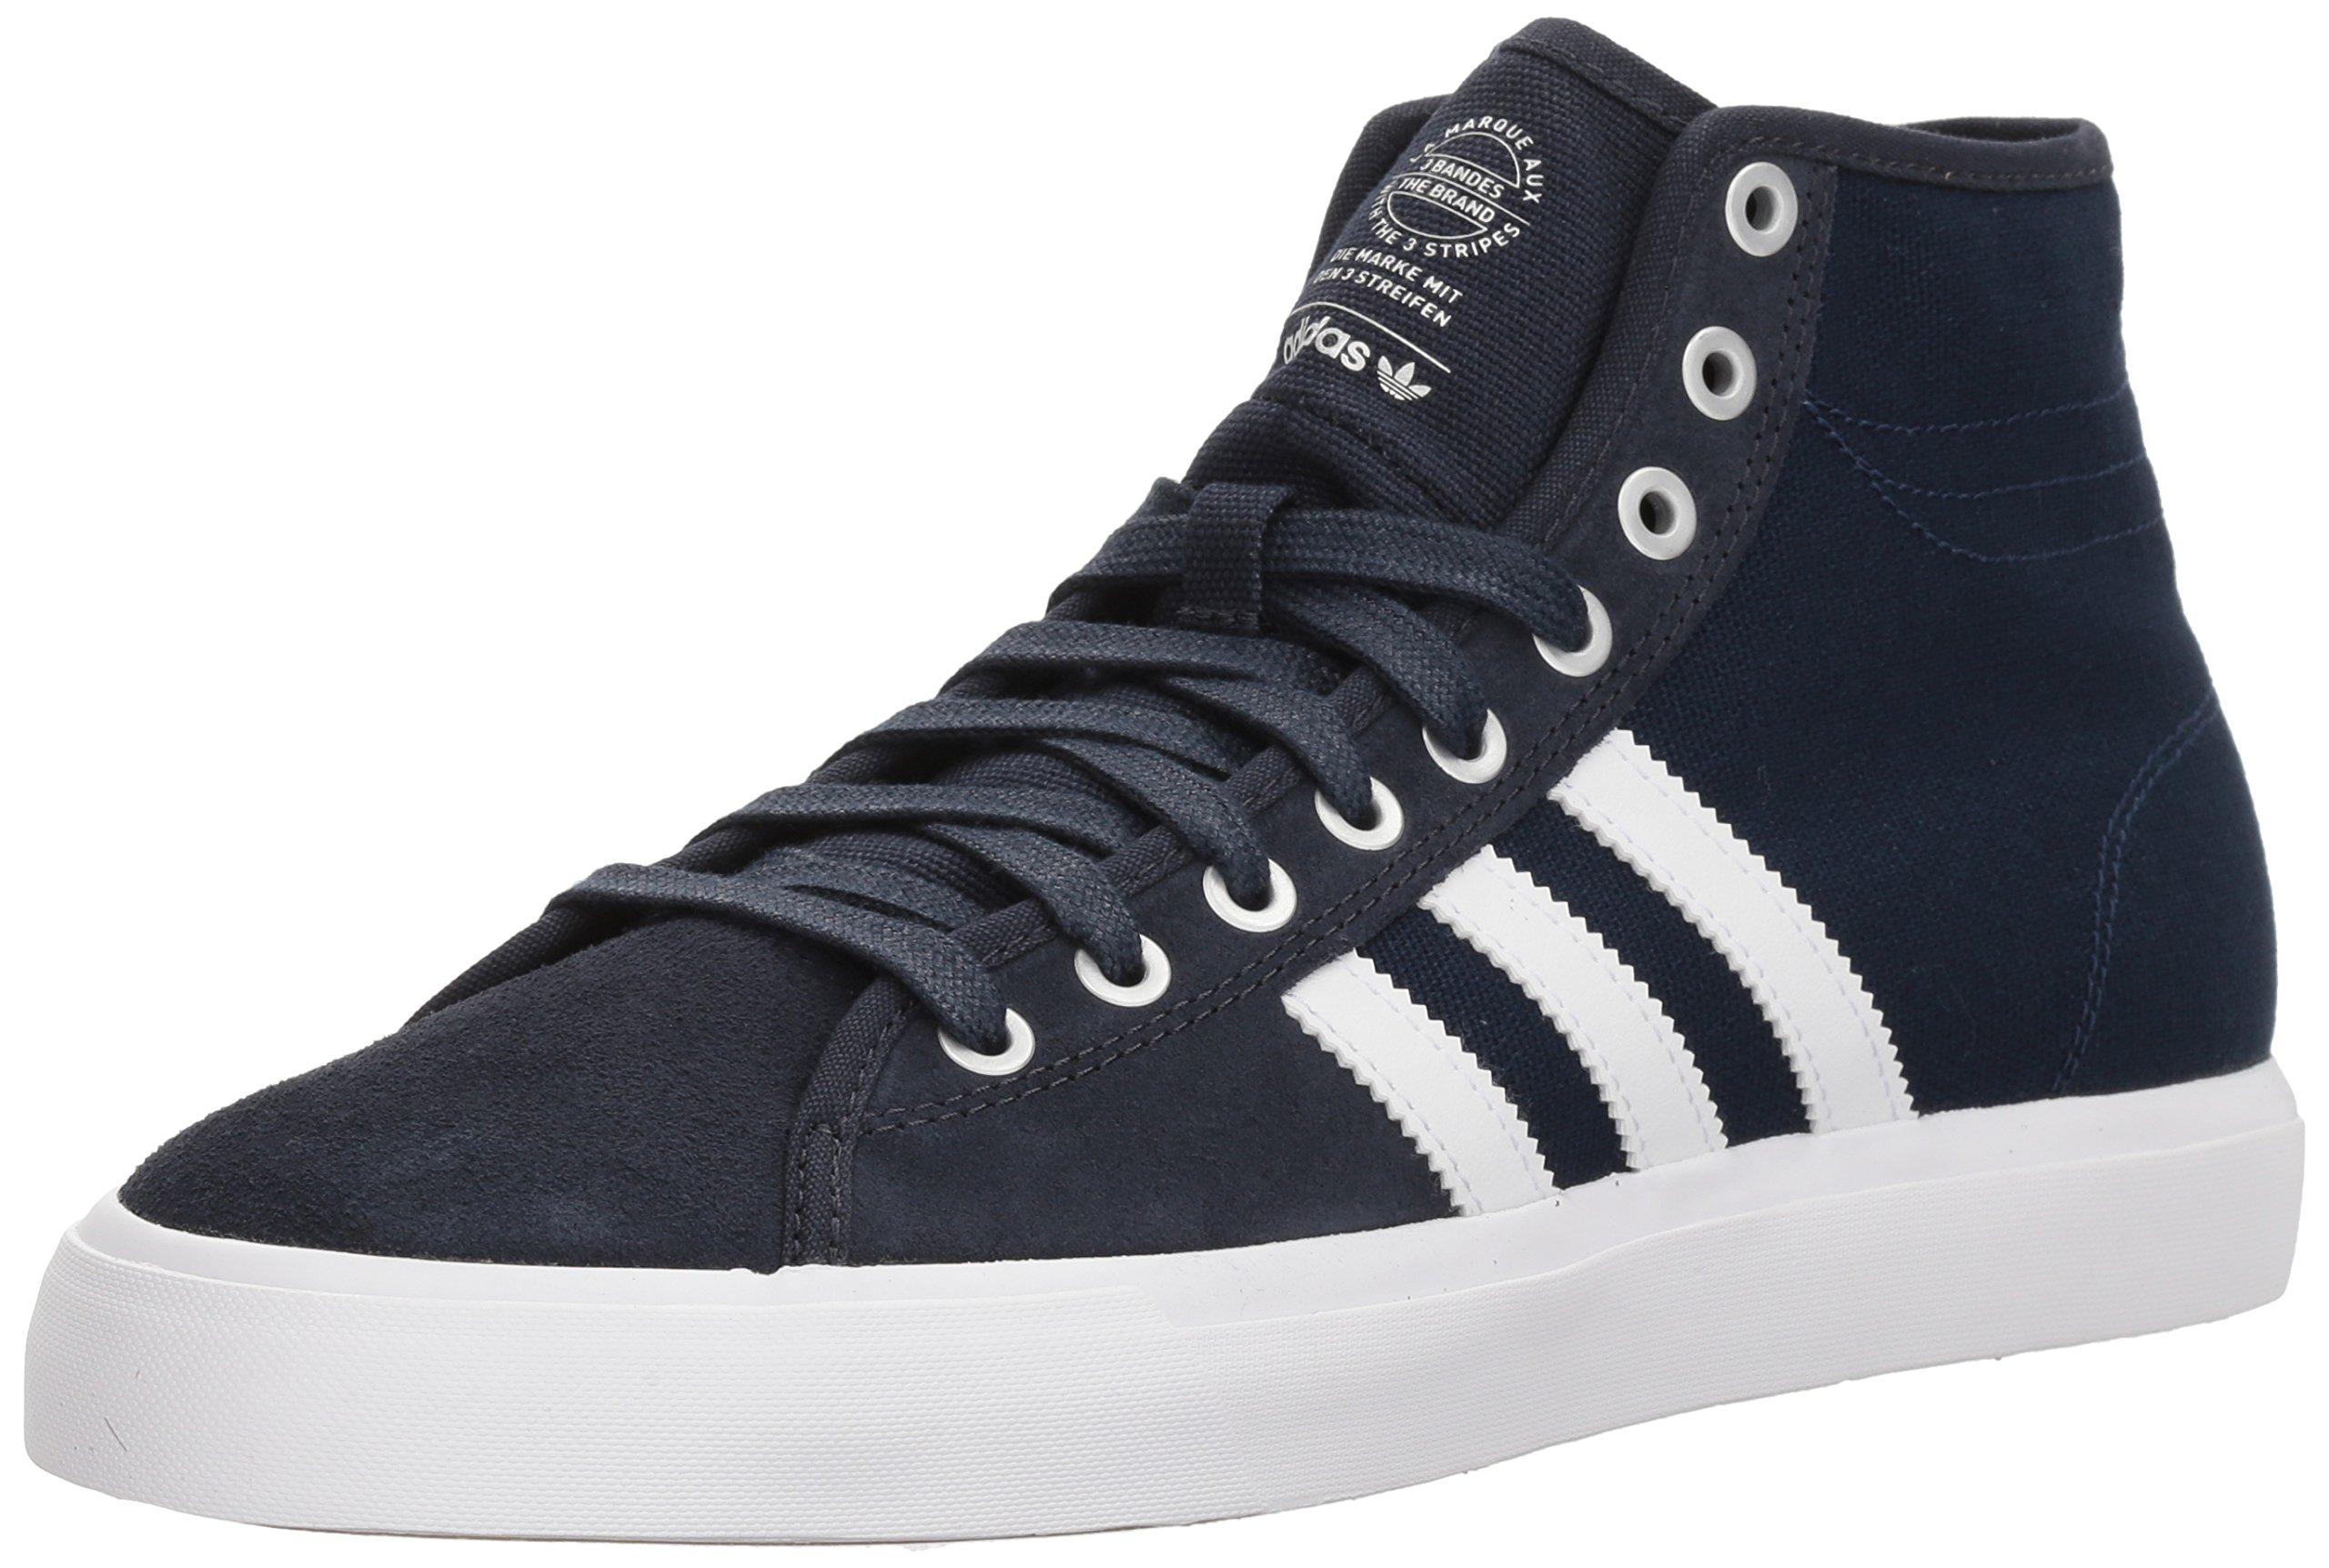 new arrival c7276 acb02 Galleon - Adidas Originals Men s Matchcourt HIGH RX Running Shoe, Night  White Collegiate Navy, 10.5 M US